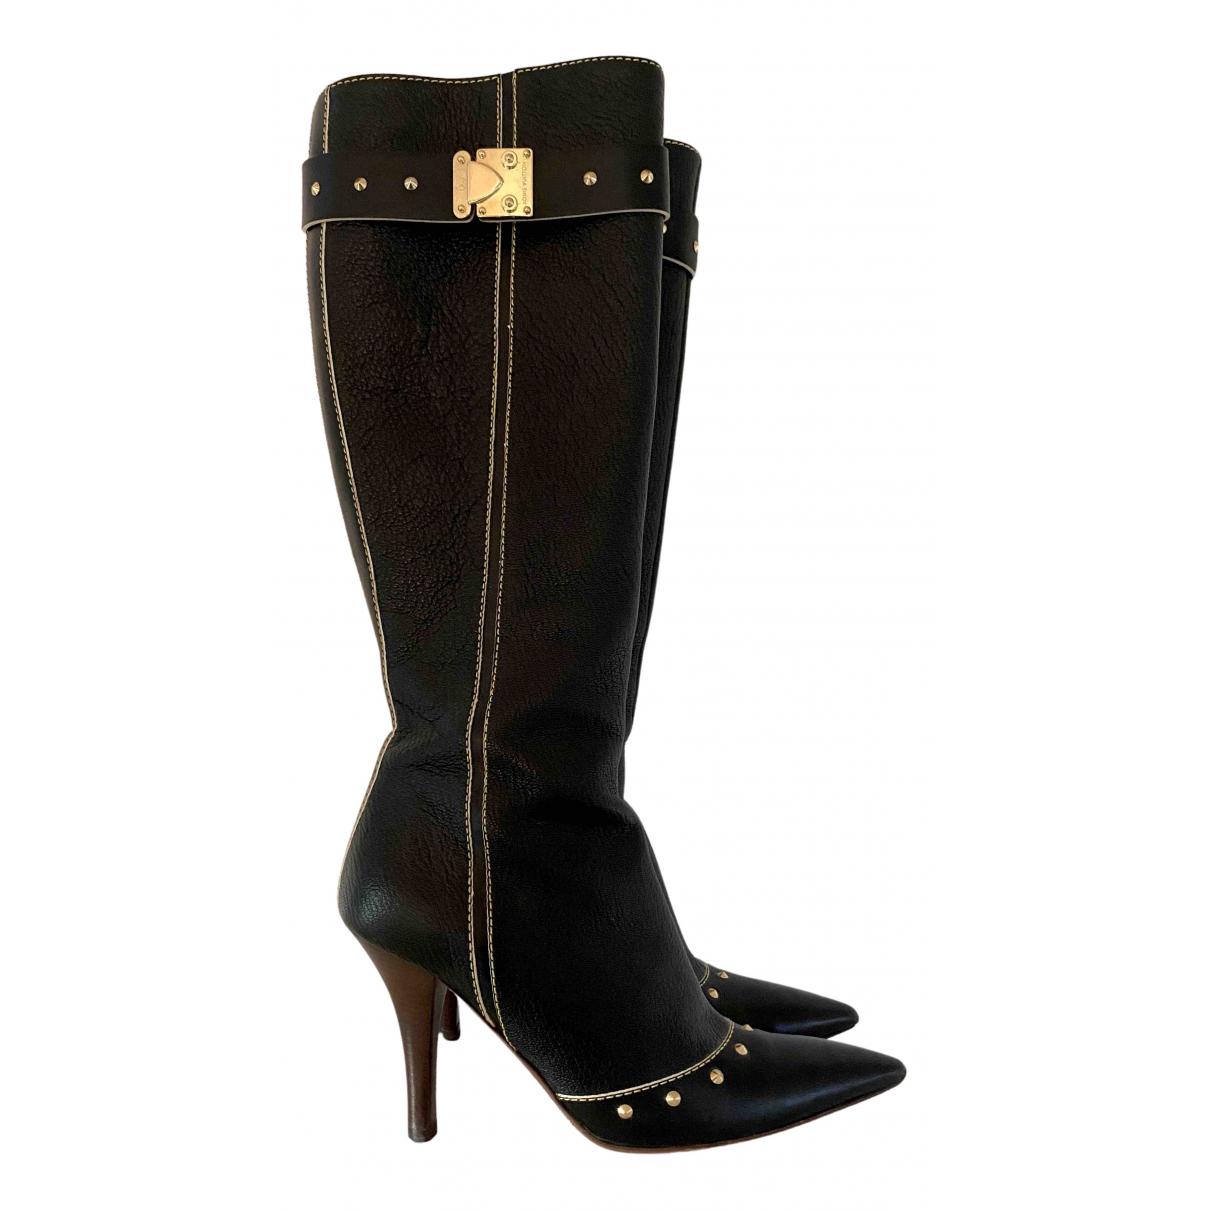 Louis Vuitton N Black Leather Boots for Women 36.5 EU